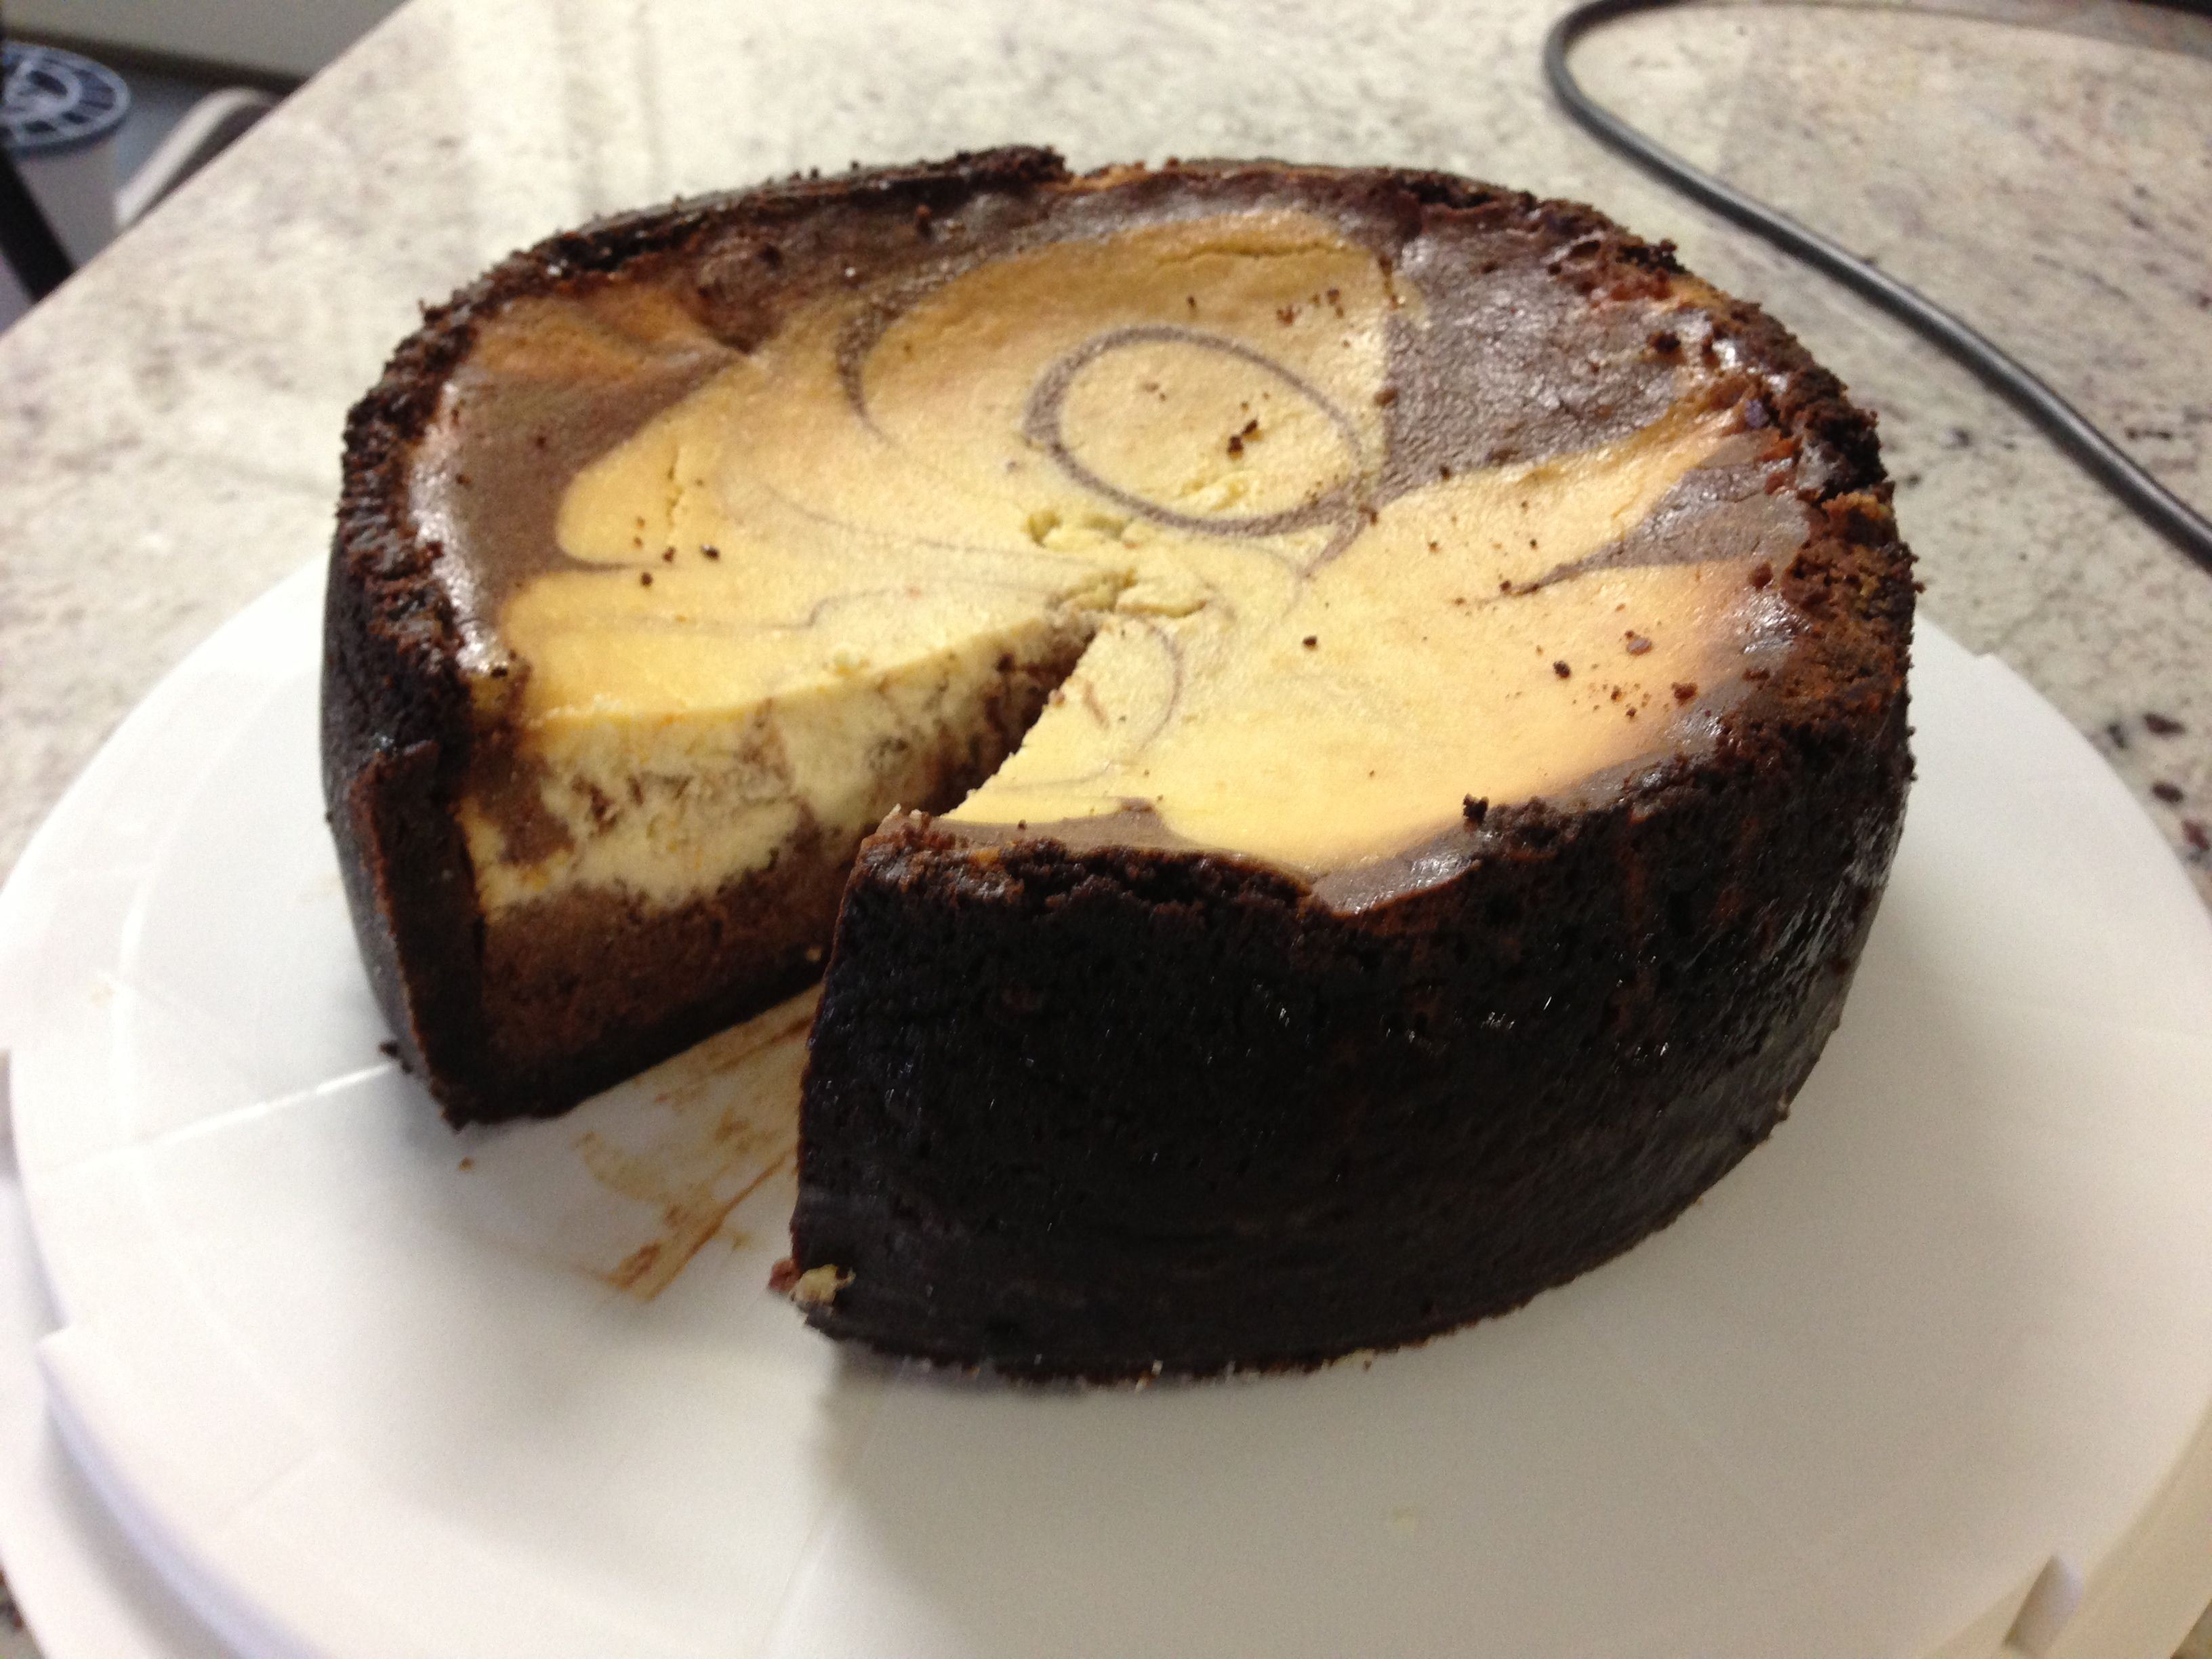 Rustic choc orange baked cheesecake